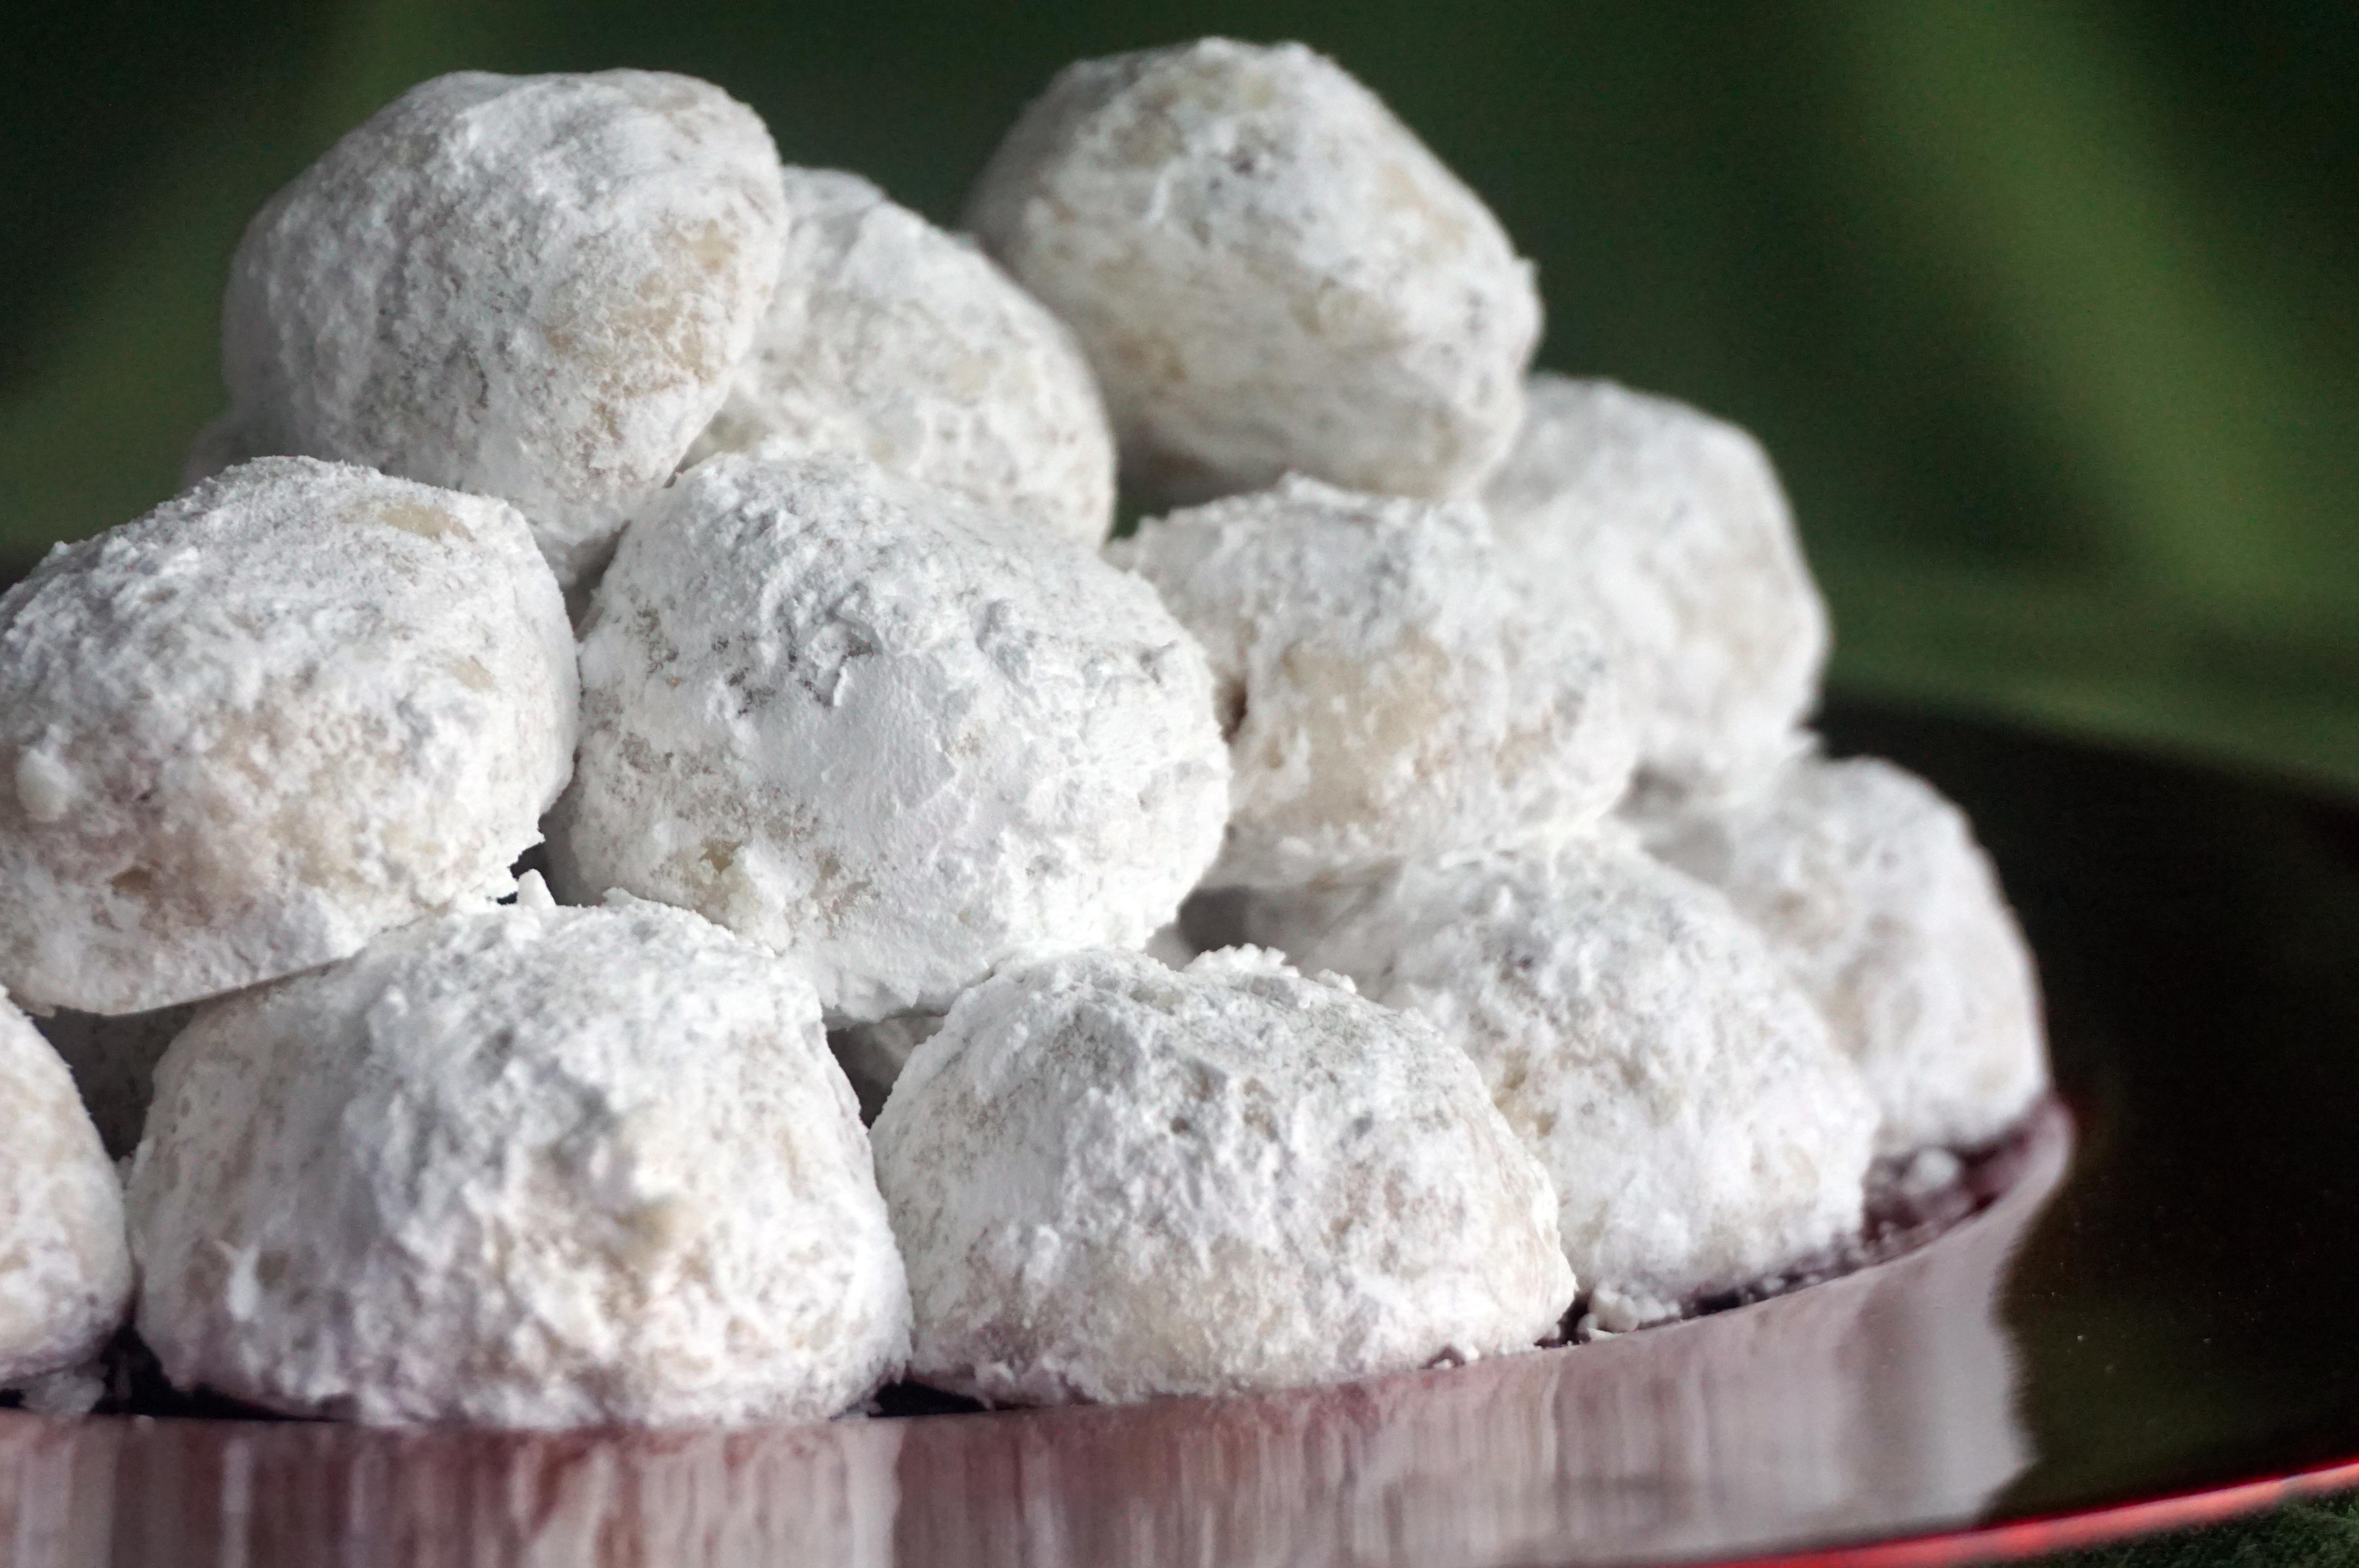 Smør Bullar: The Classic Danish Christmas Cookie No One Has Heard Of